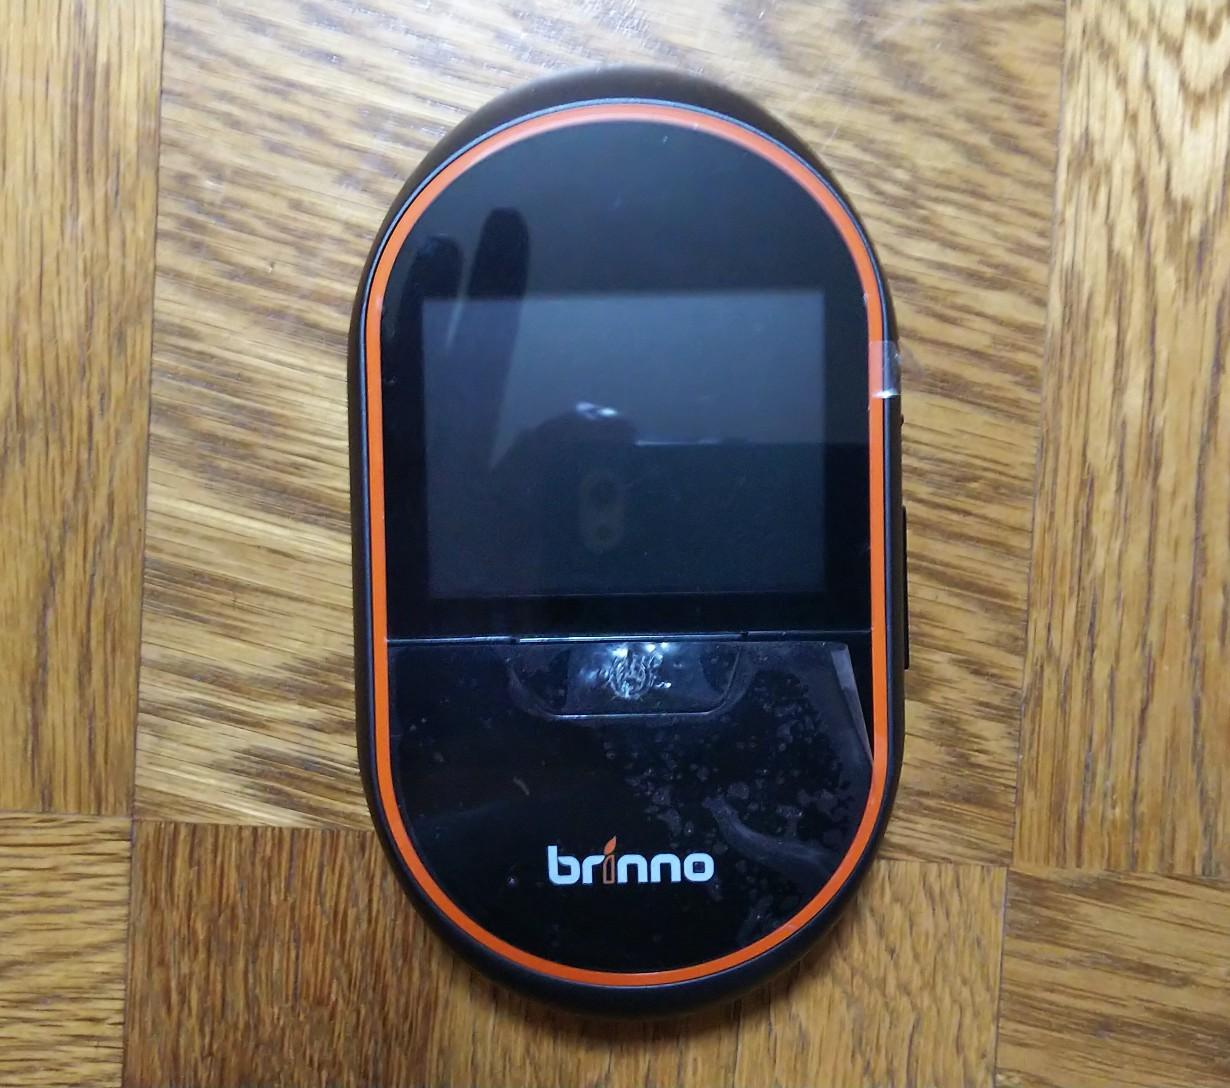 brinnoの写真